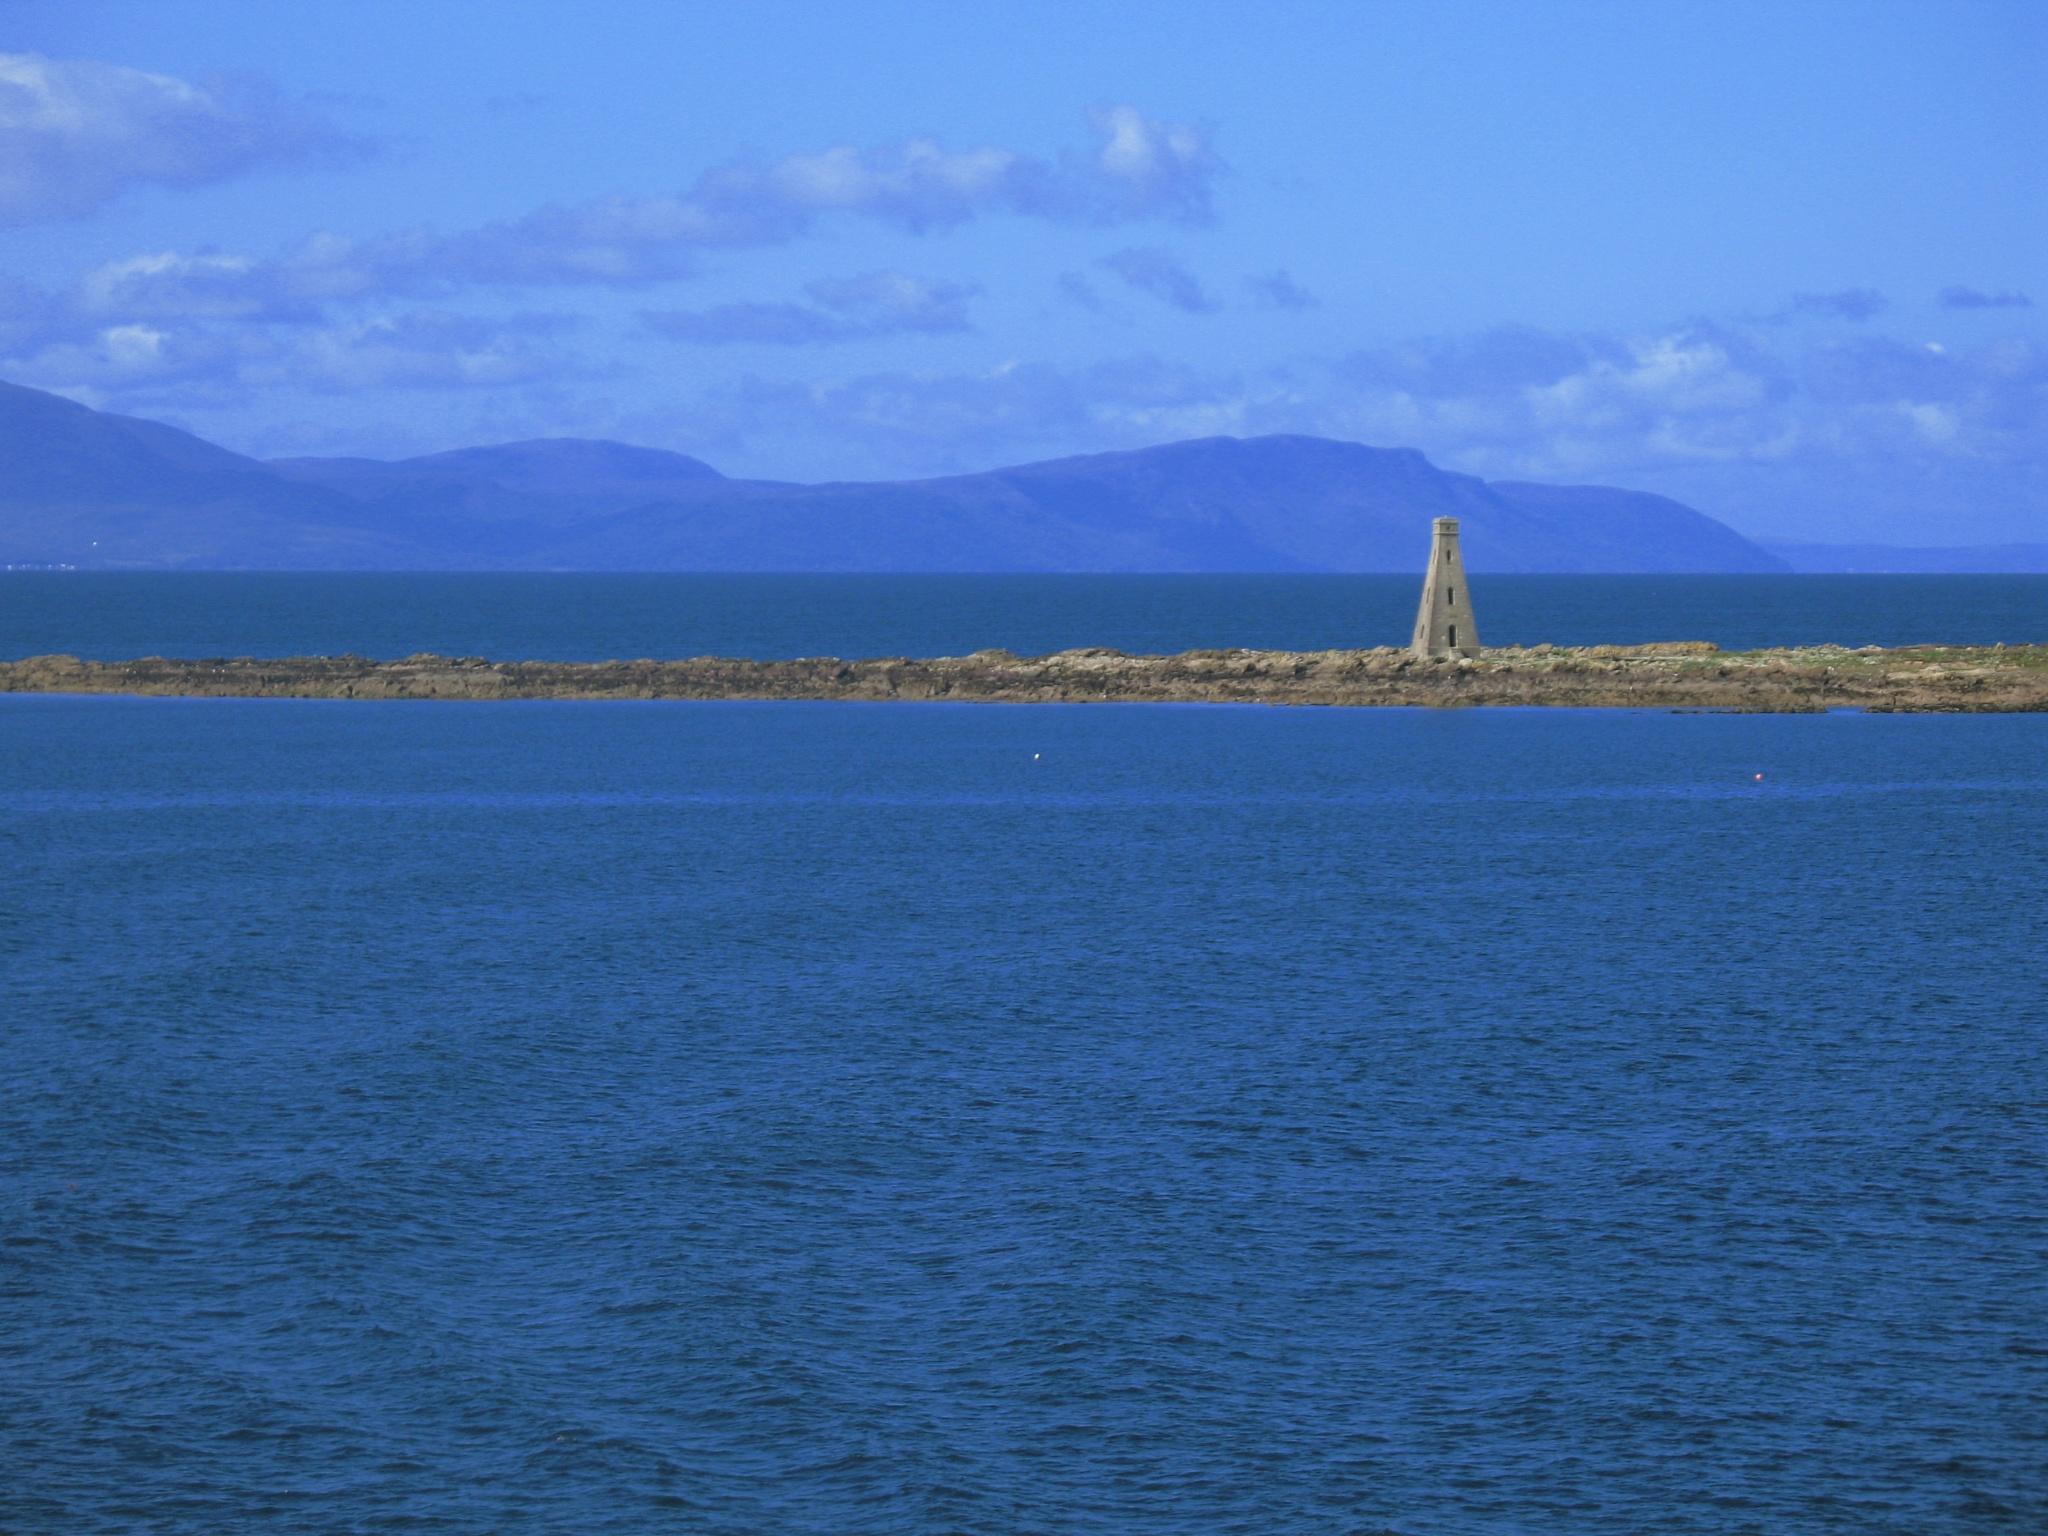 Blue view of Arran by AJ Yakstrangler Andy Jamieson